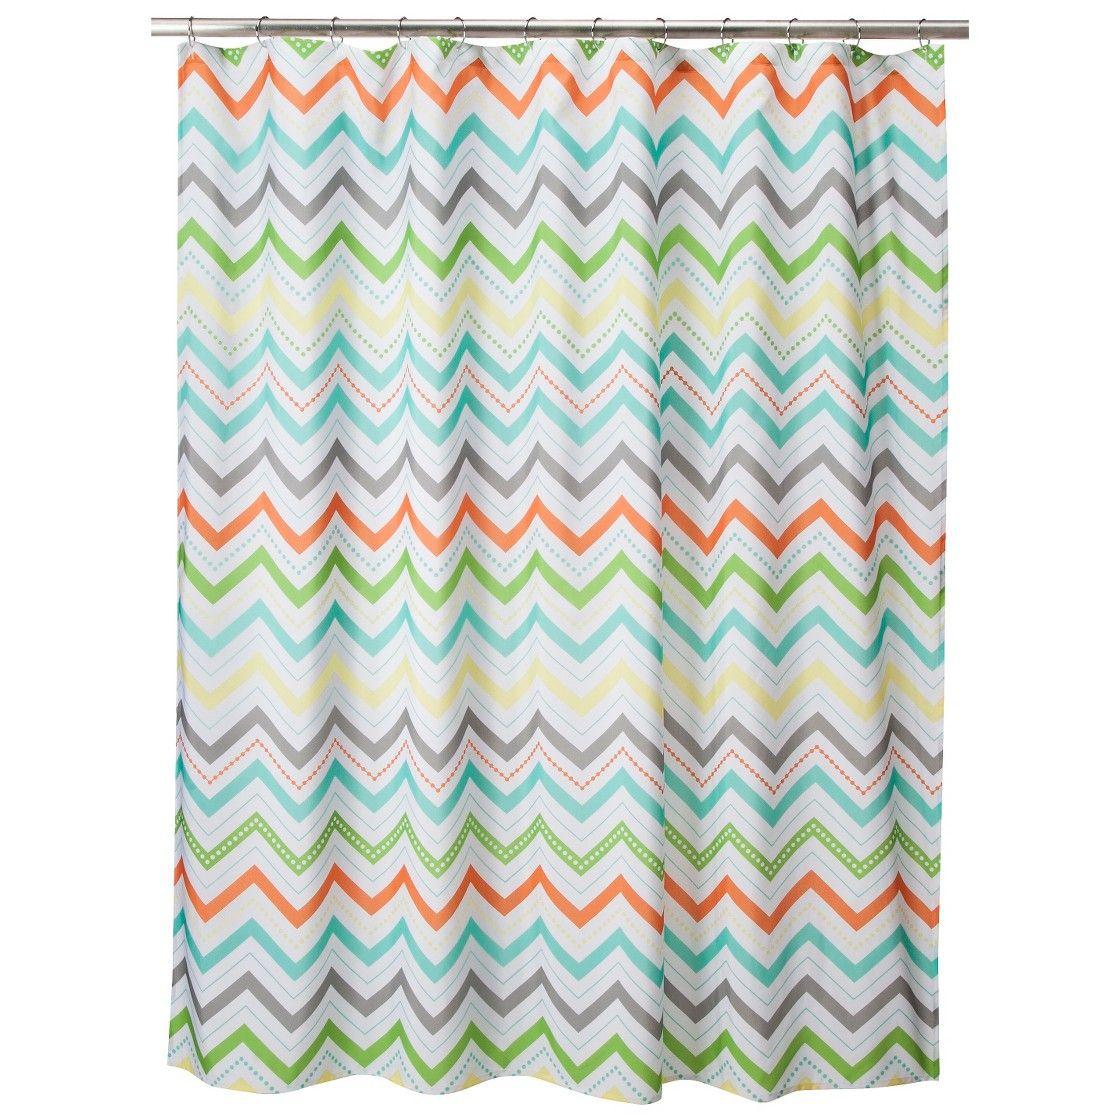 Circo Chevron Shower Curtain - Orange - boys bathroom with light ...